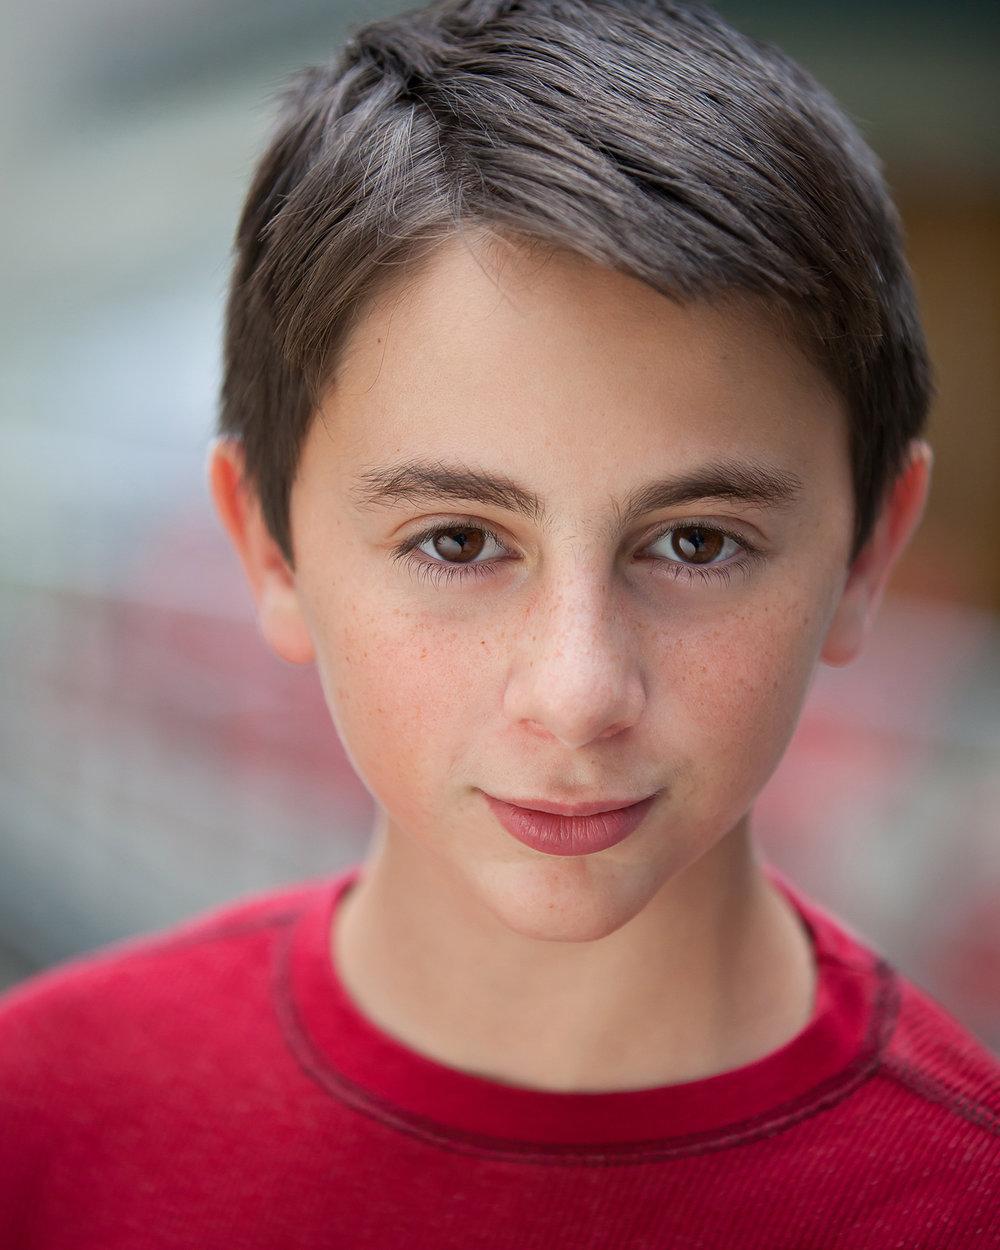 Child boy Actor Headshots with Denver photographer Jennifer Koskinen   Merritt Portrait Studio